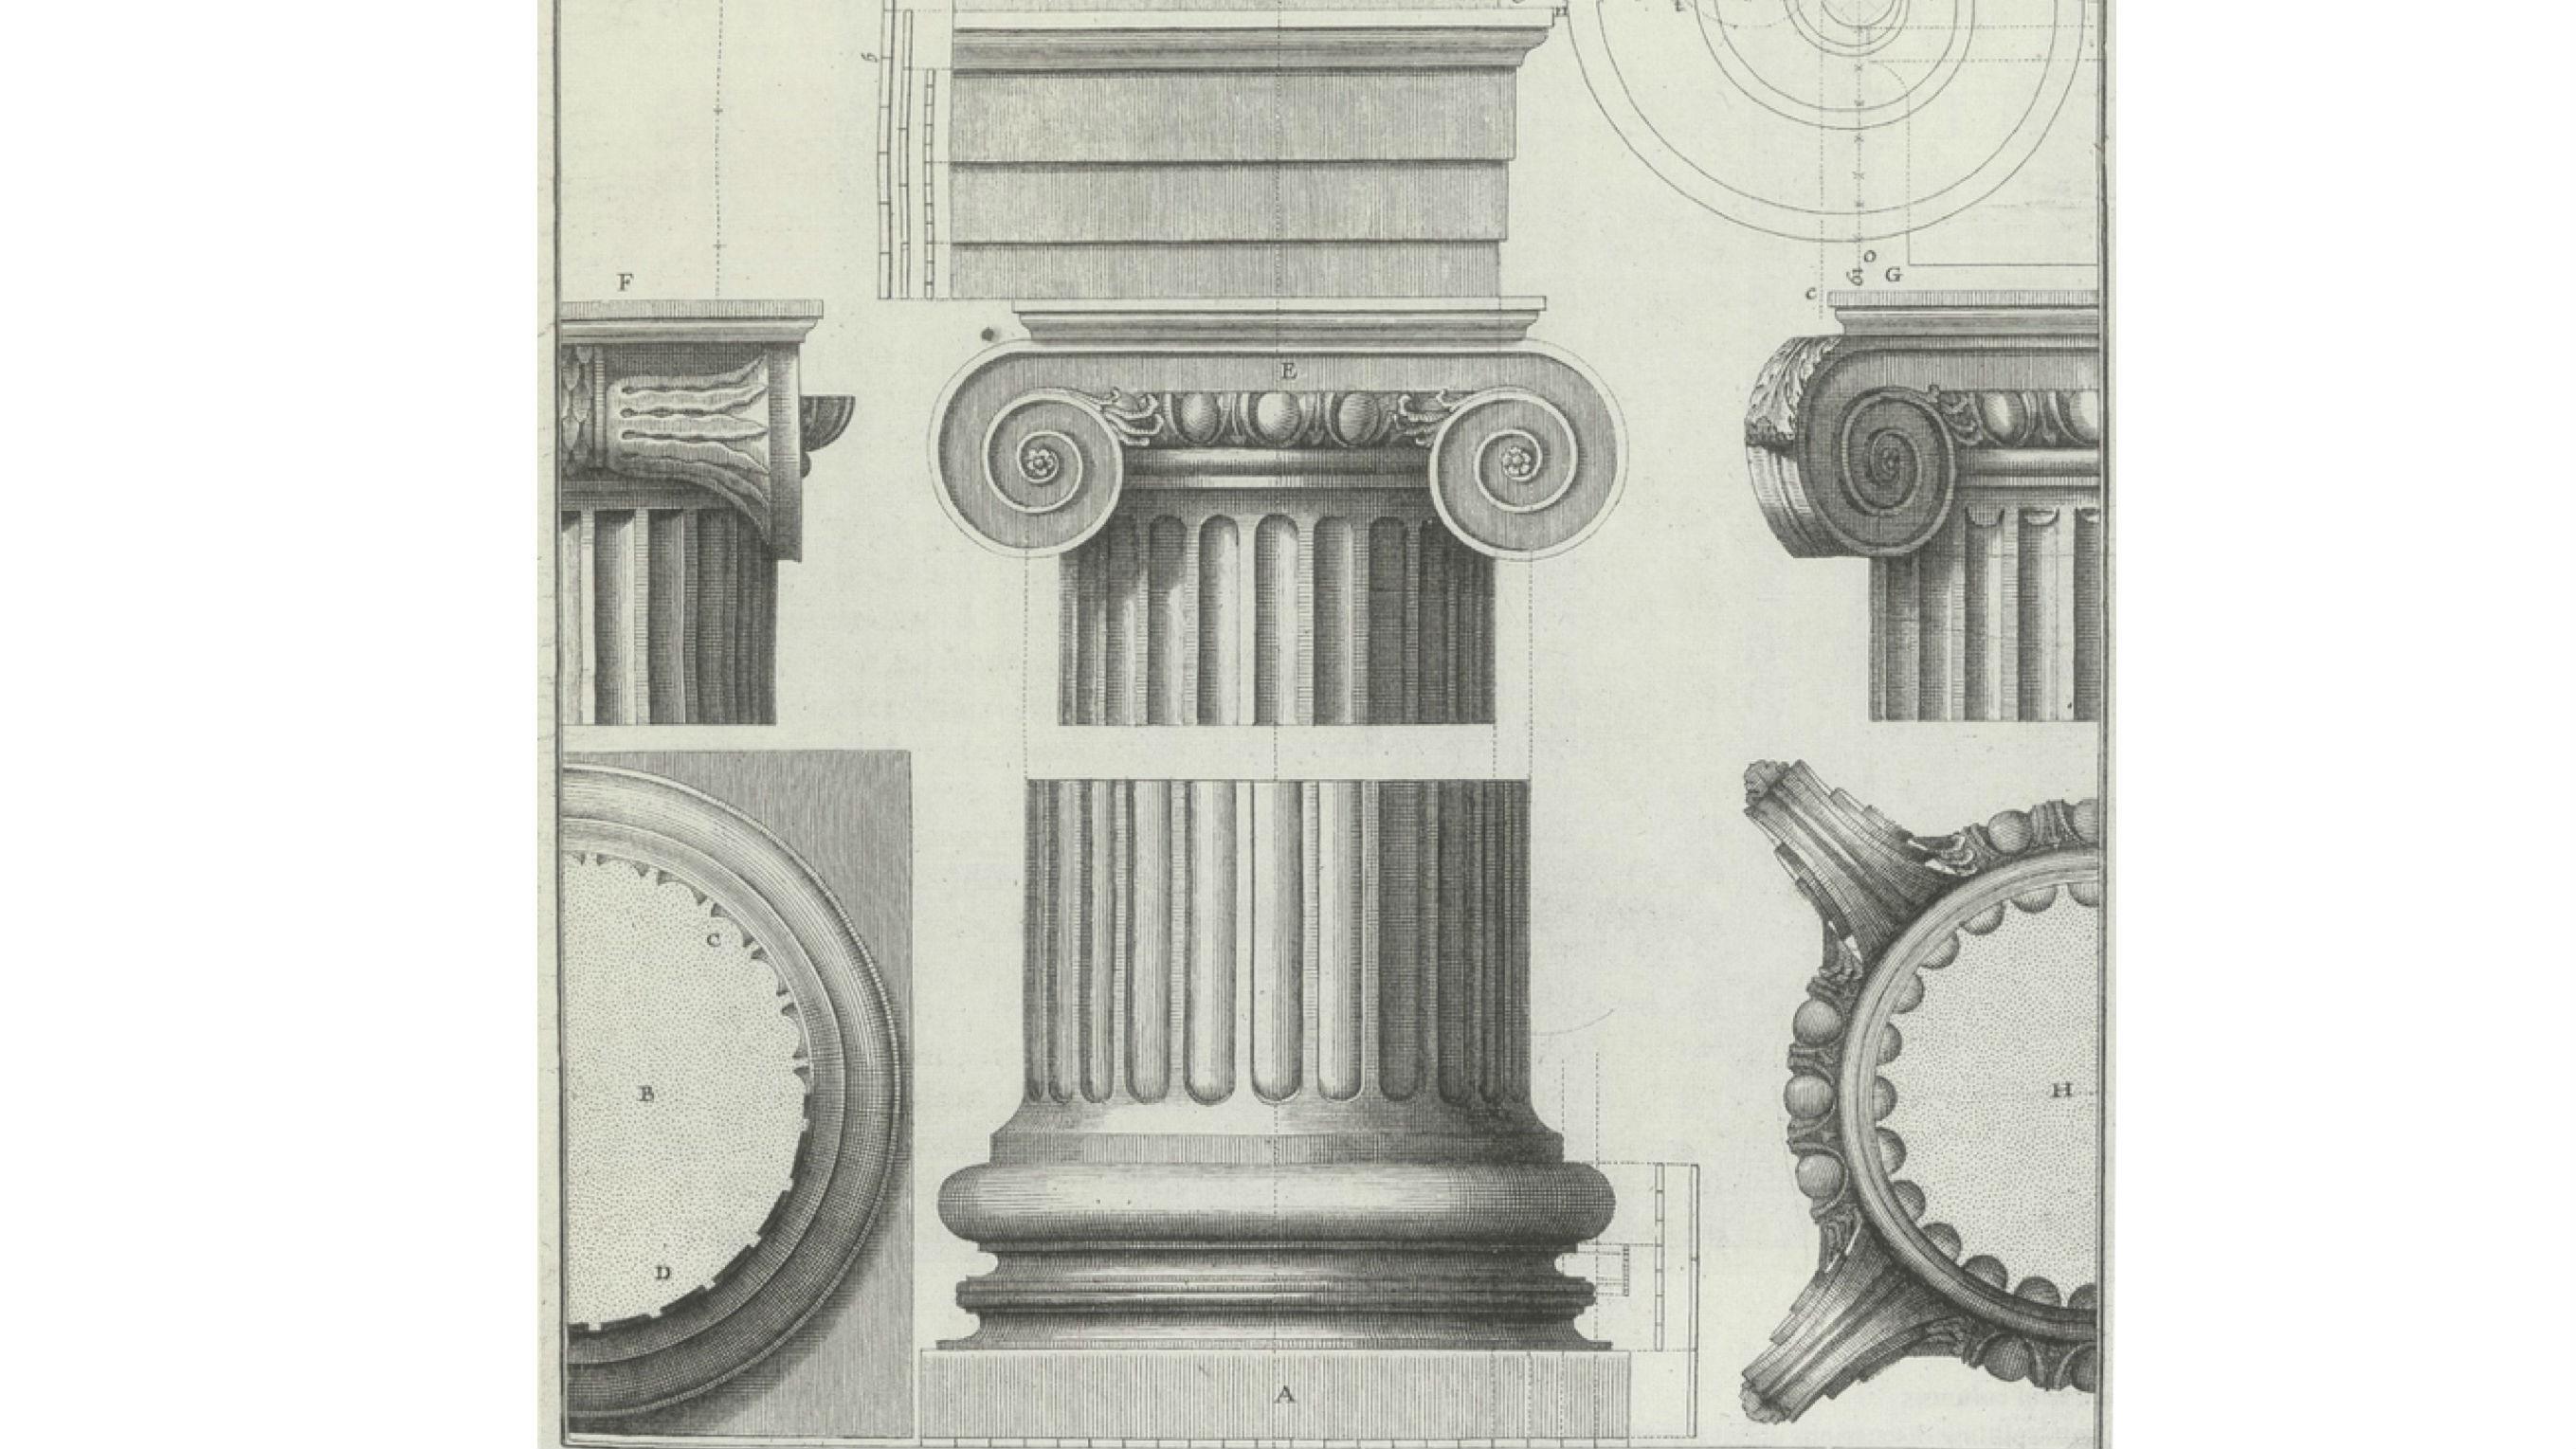 ionic order buildings